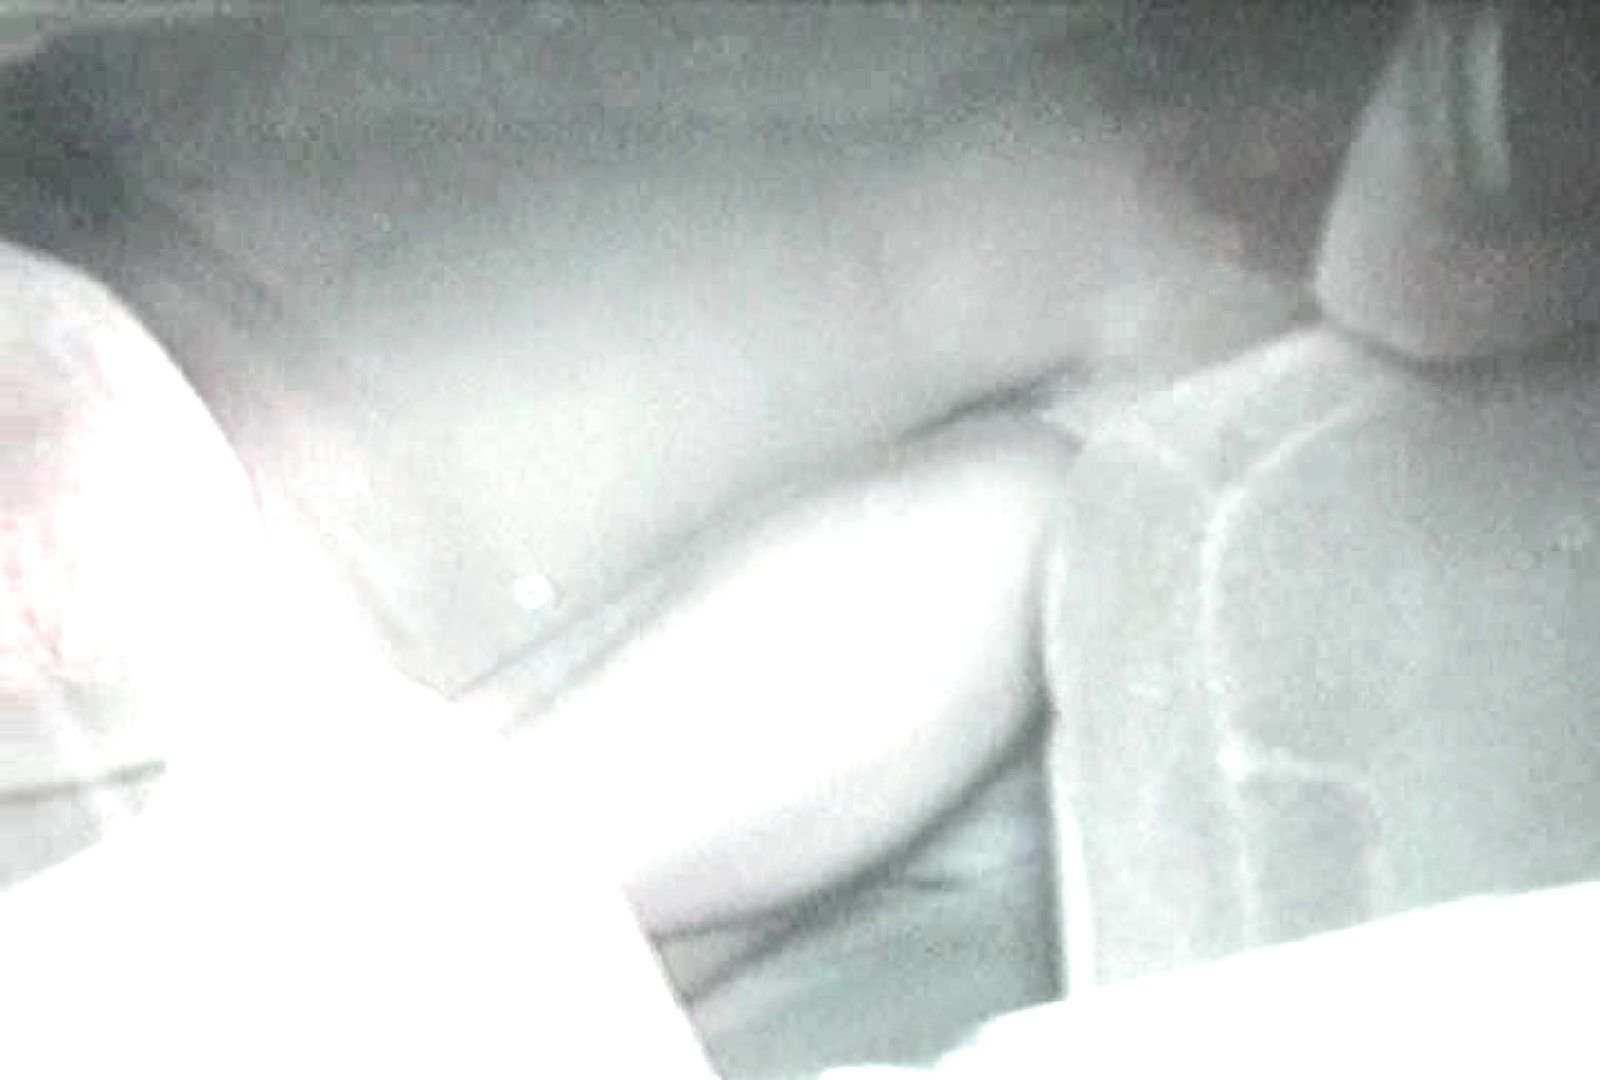 充血監督の深夜の運動会Vol.88 細身 戯れ無修正画像 73画像 29